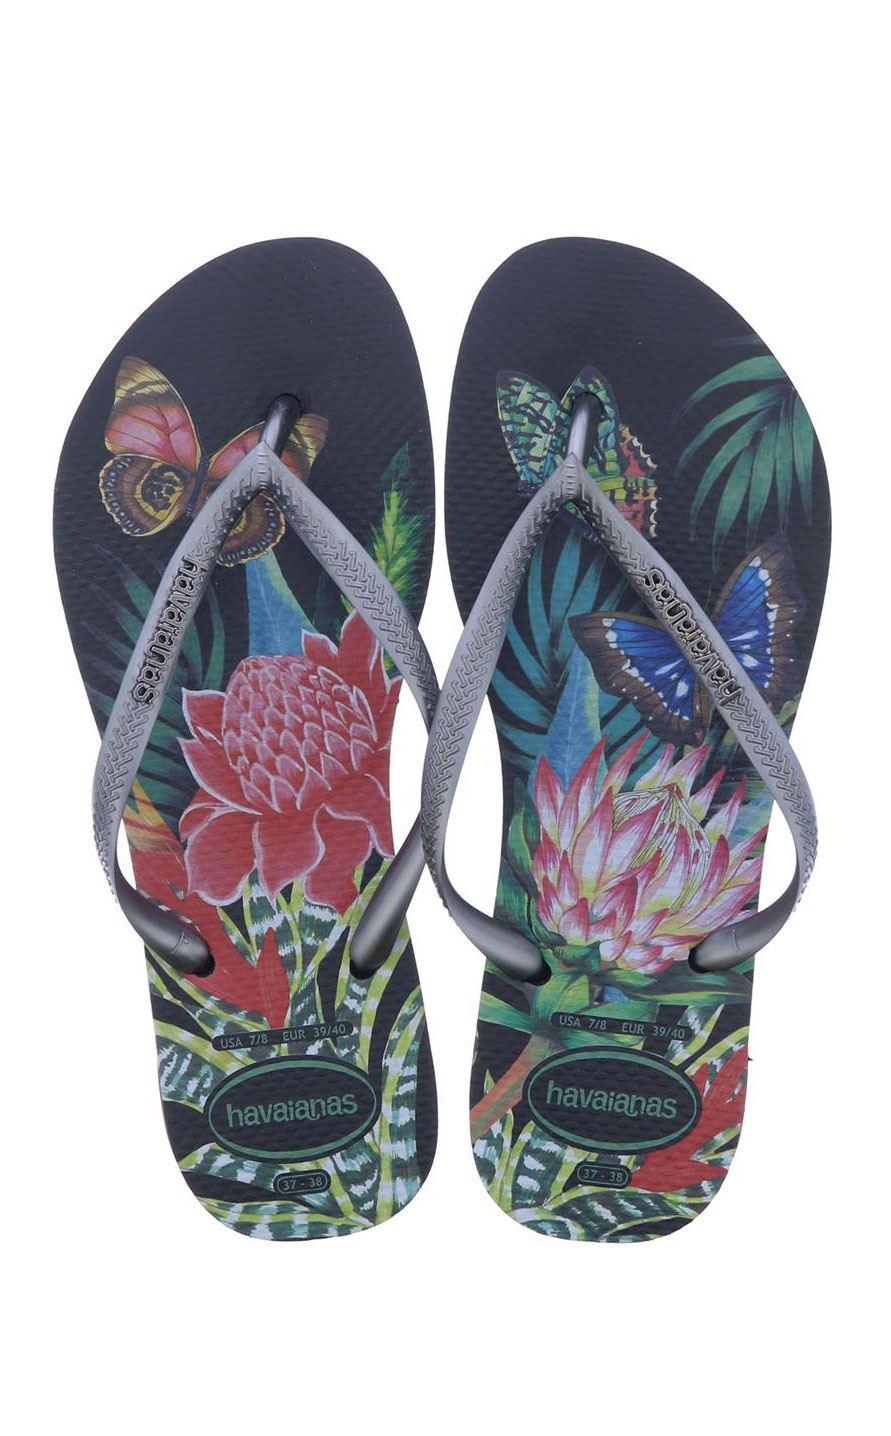 ae06730ba Havaianas Slim Women Tropical Blue Green Rose Black Ivory Flip Flops All  Sizes